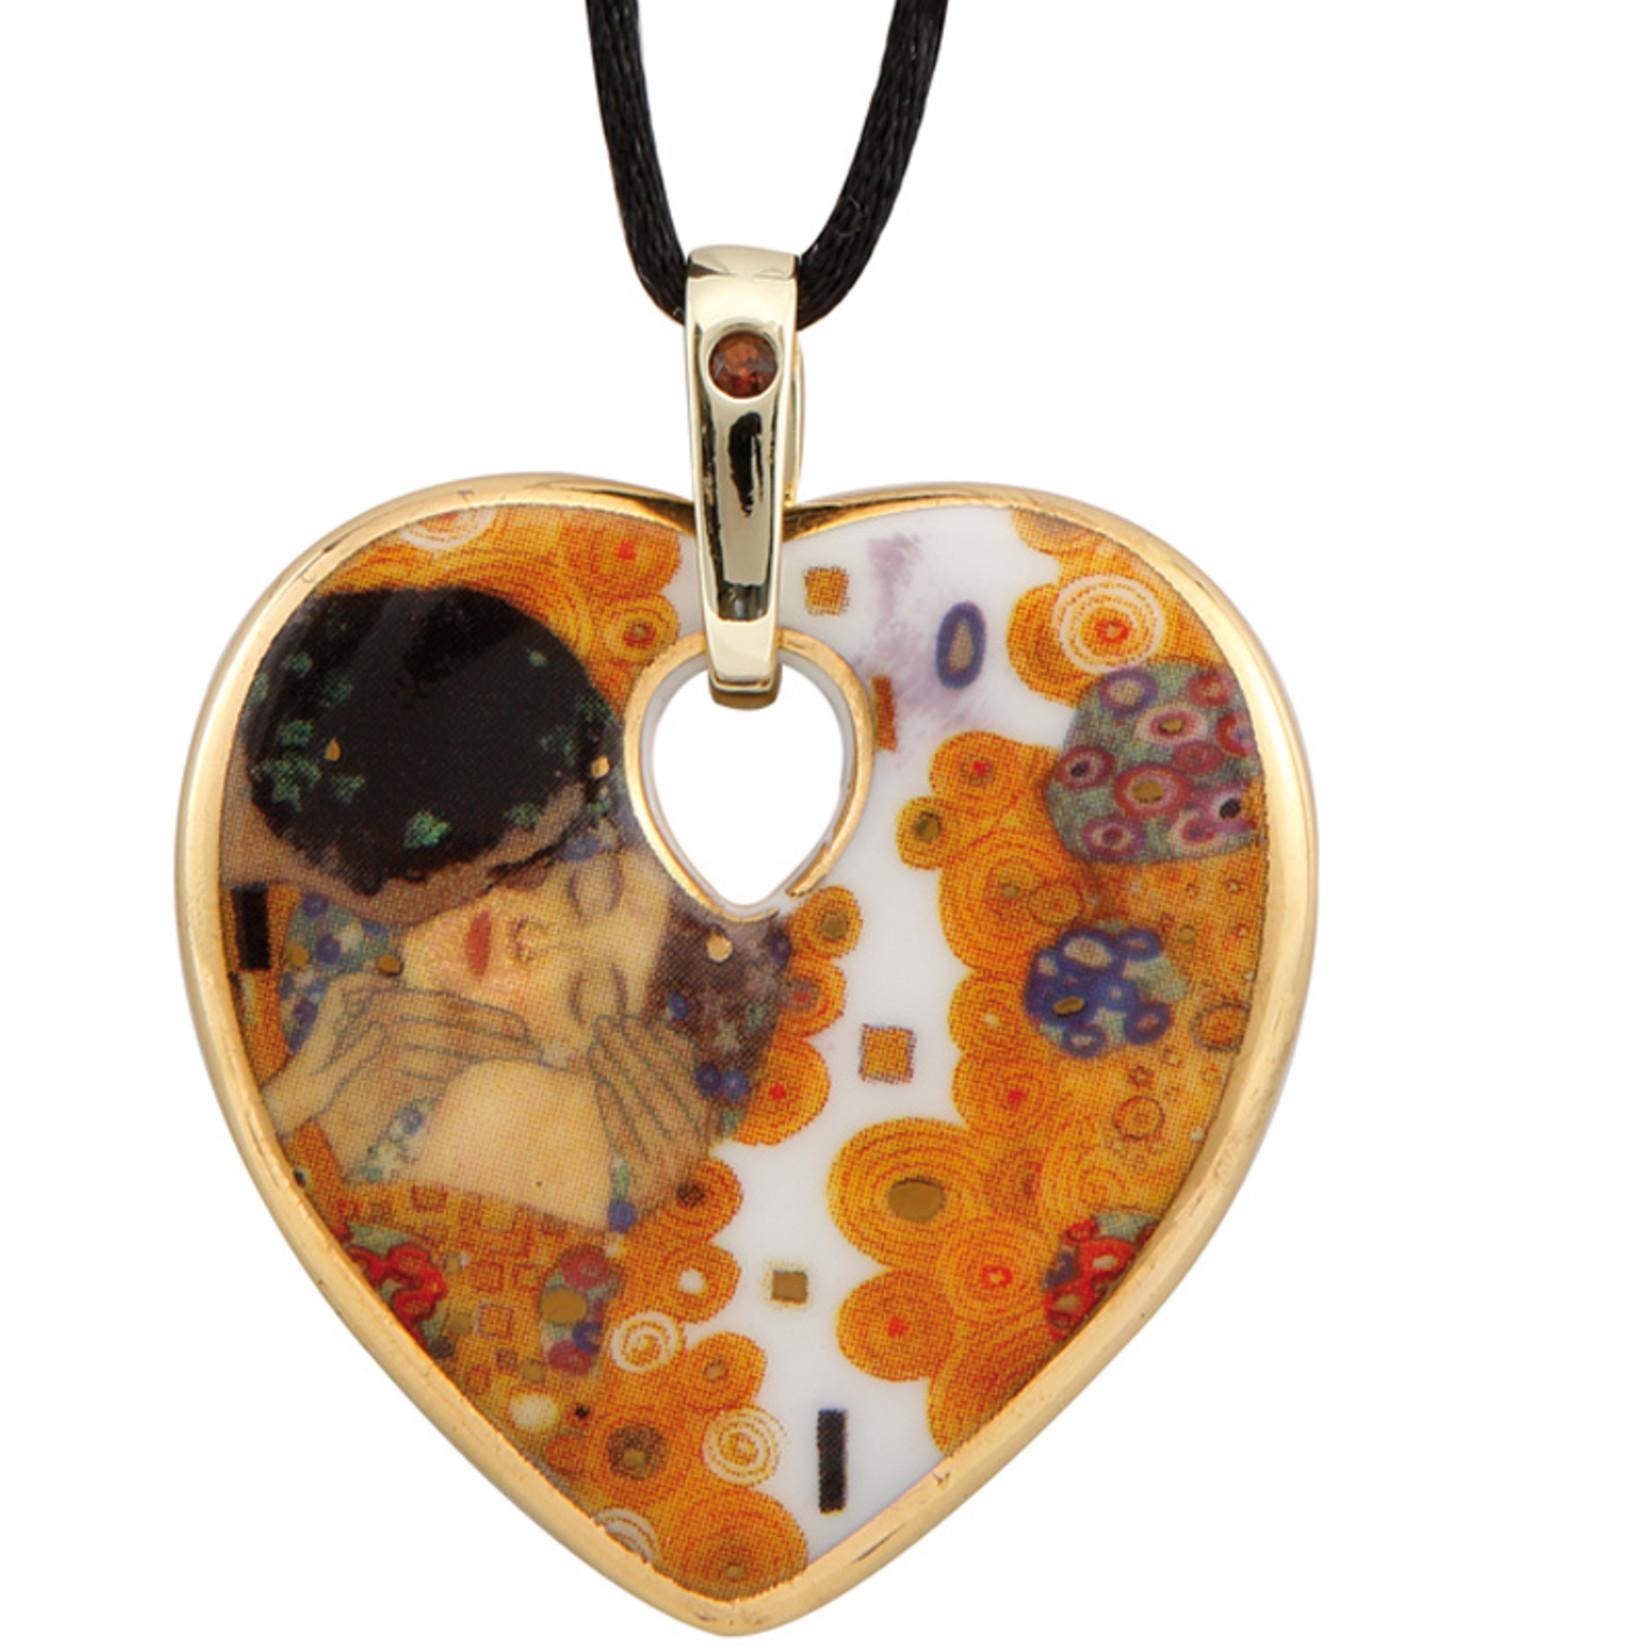 Goebel Porzellanmanufaktur Kette Der Kuss I Goebel Porzellan I Gustav Klimt I Herz